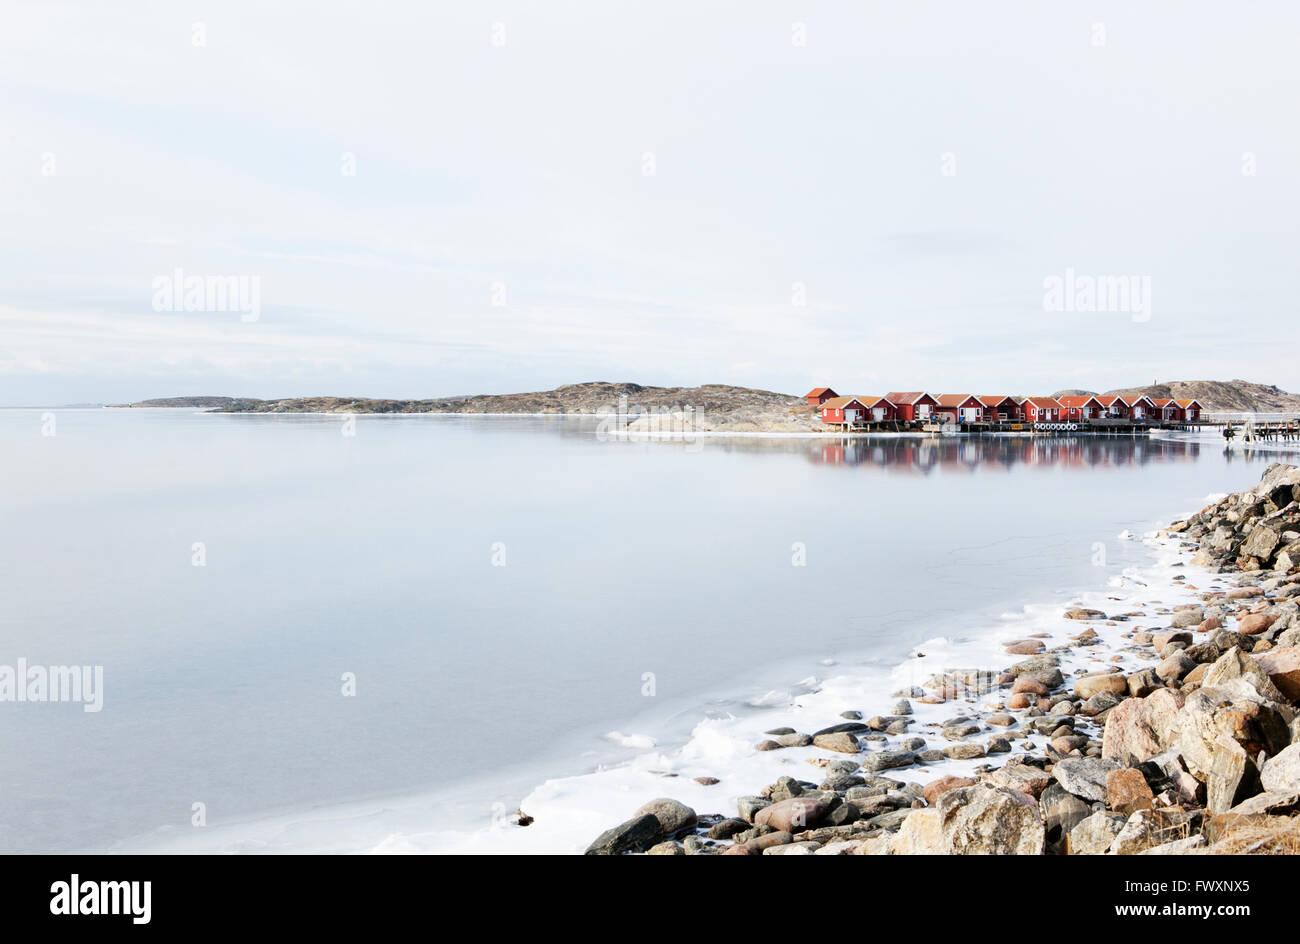 Sweden, Bohuslan, Orust, Edshultshall, Wooden houses and rocky coastline in winter Stock Photo